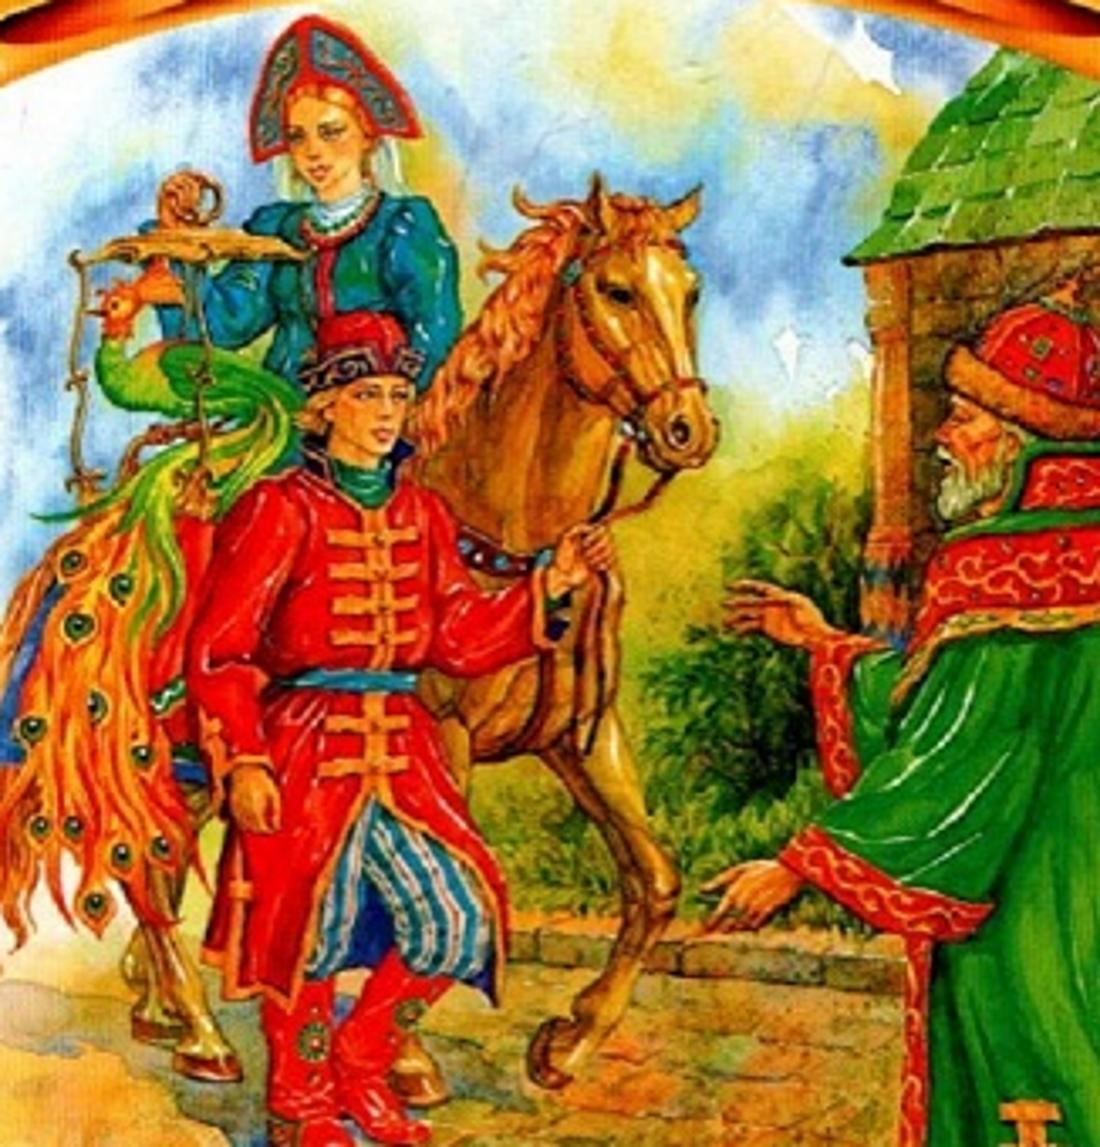 Рисунок ивана царевича из сказки